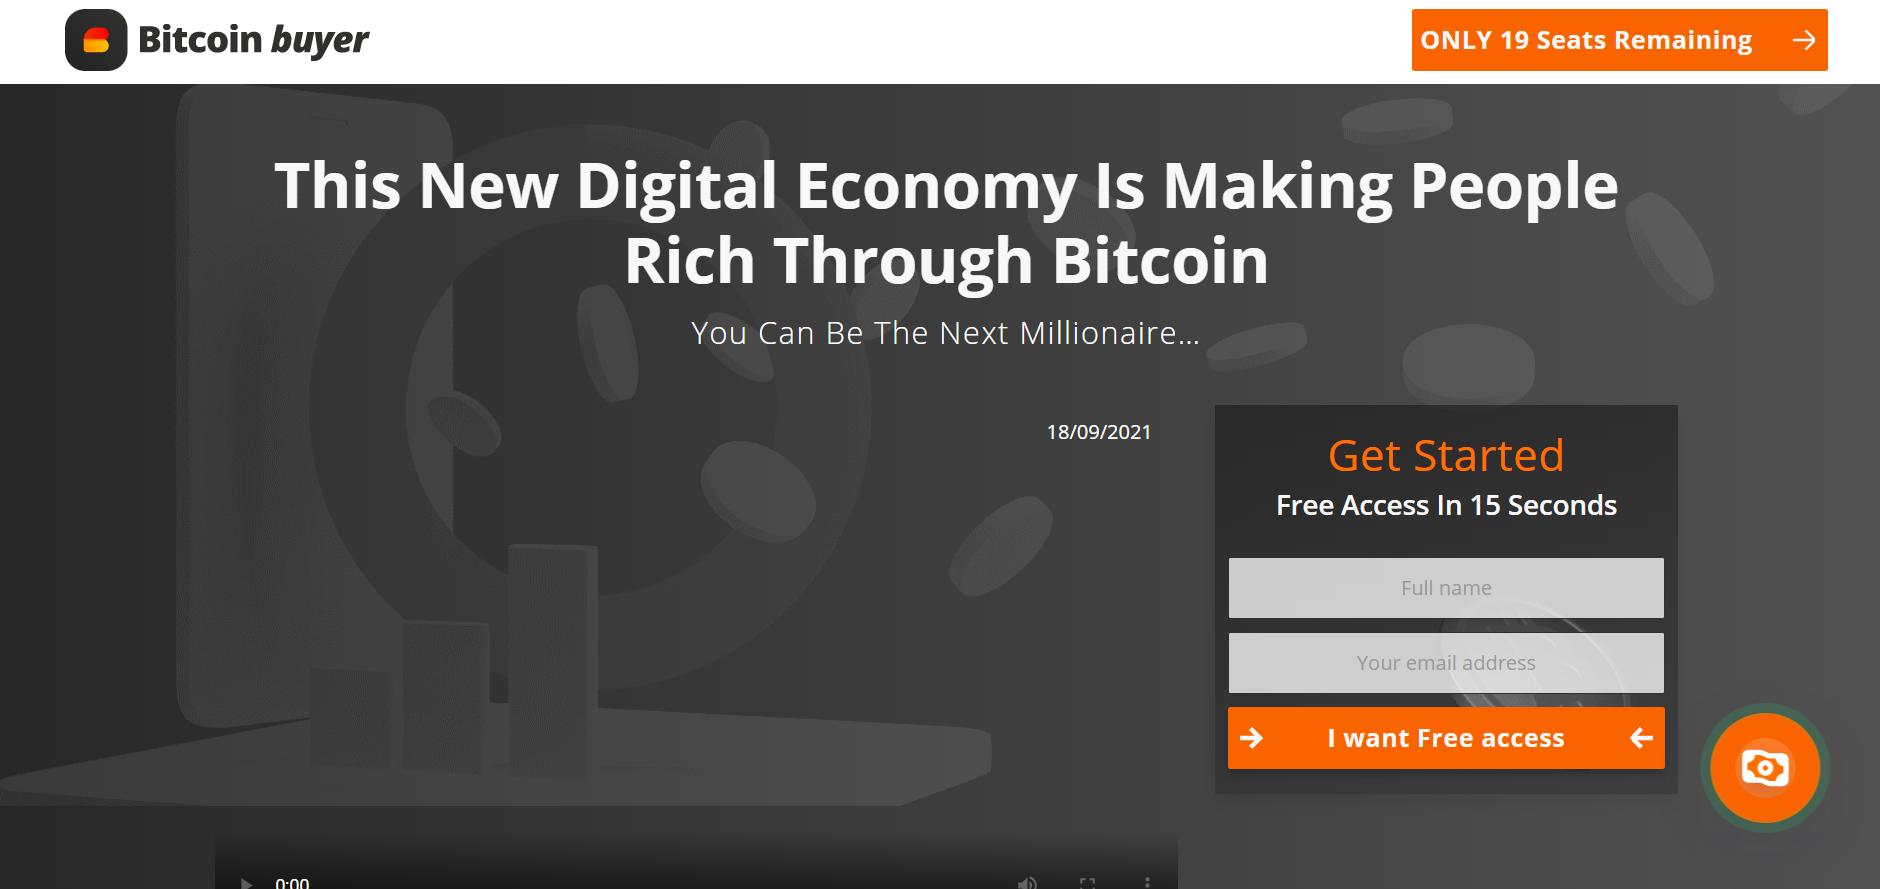 bitcoin buyer review register login